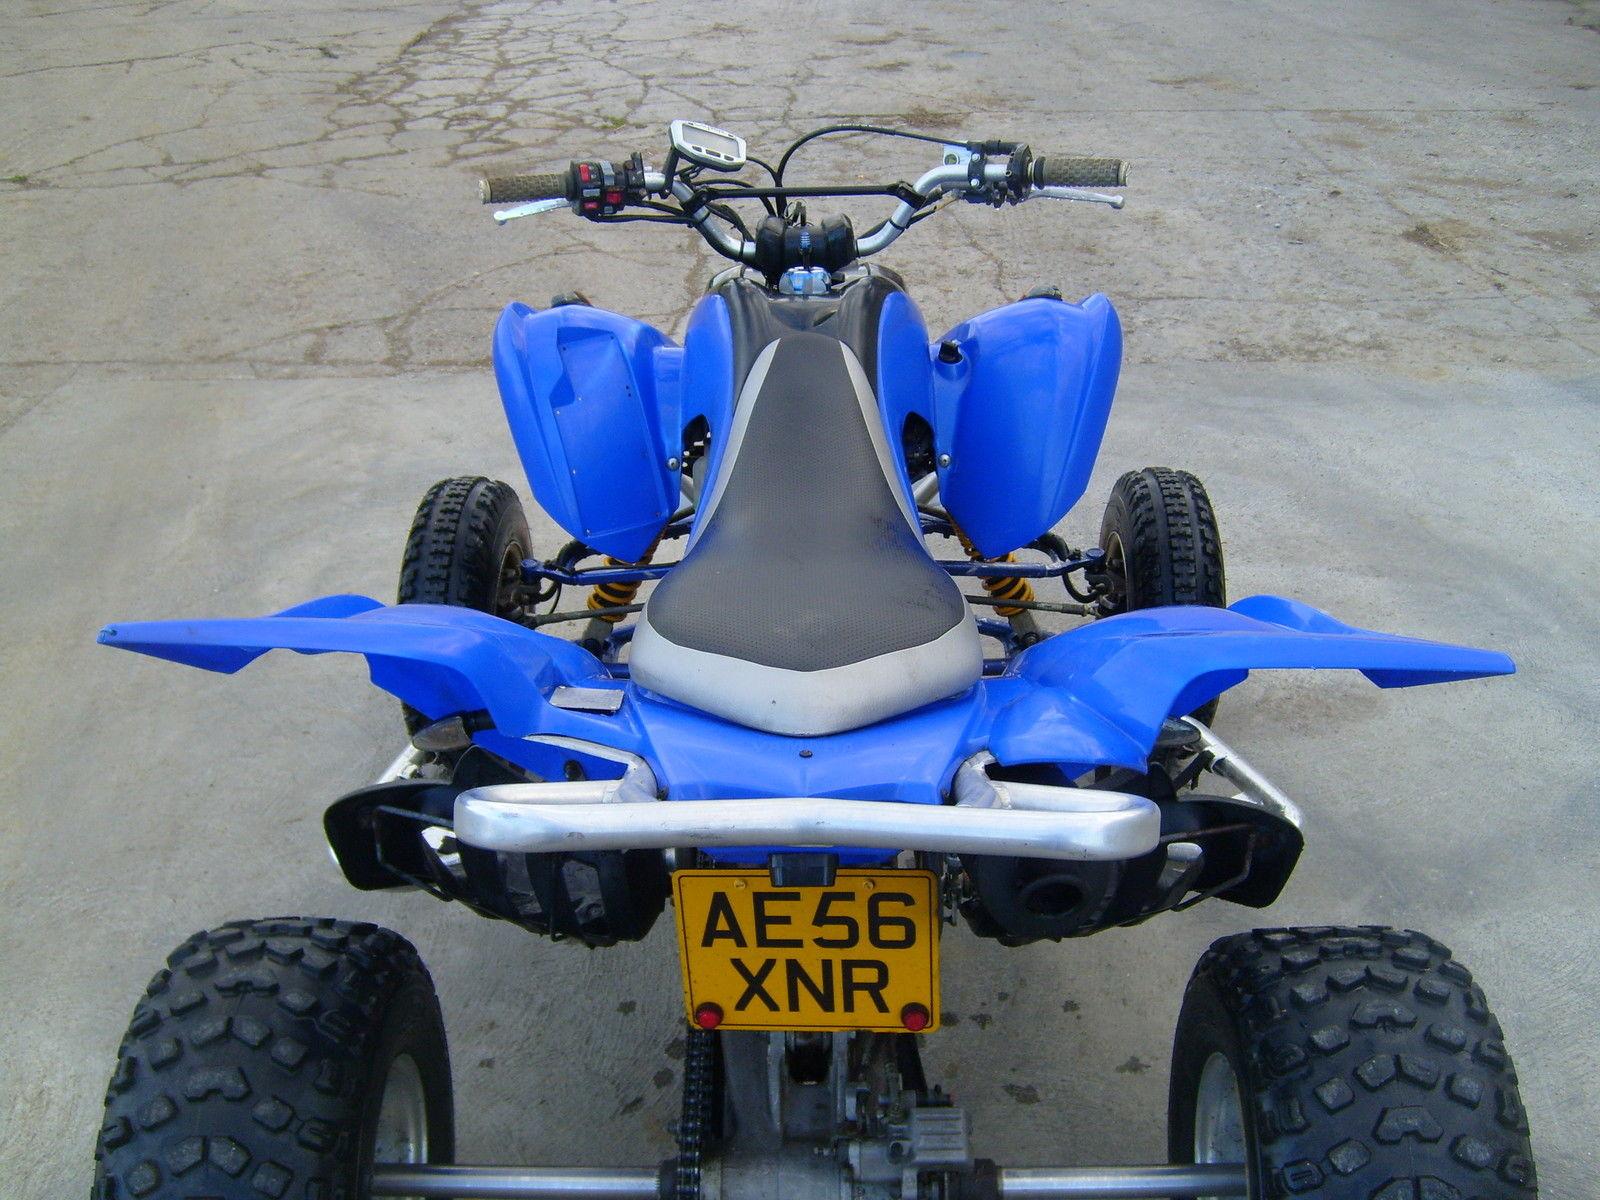 2007 yamaha raptor 700r road legal racing quad bike blue for 2007 yamaha raptor 350 top speed